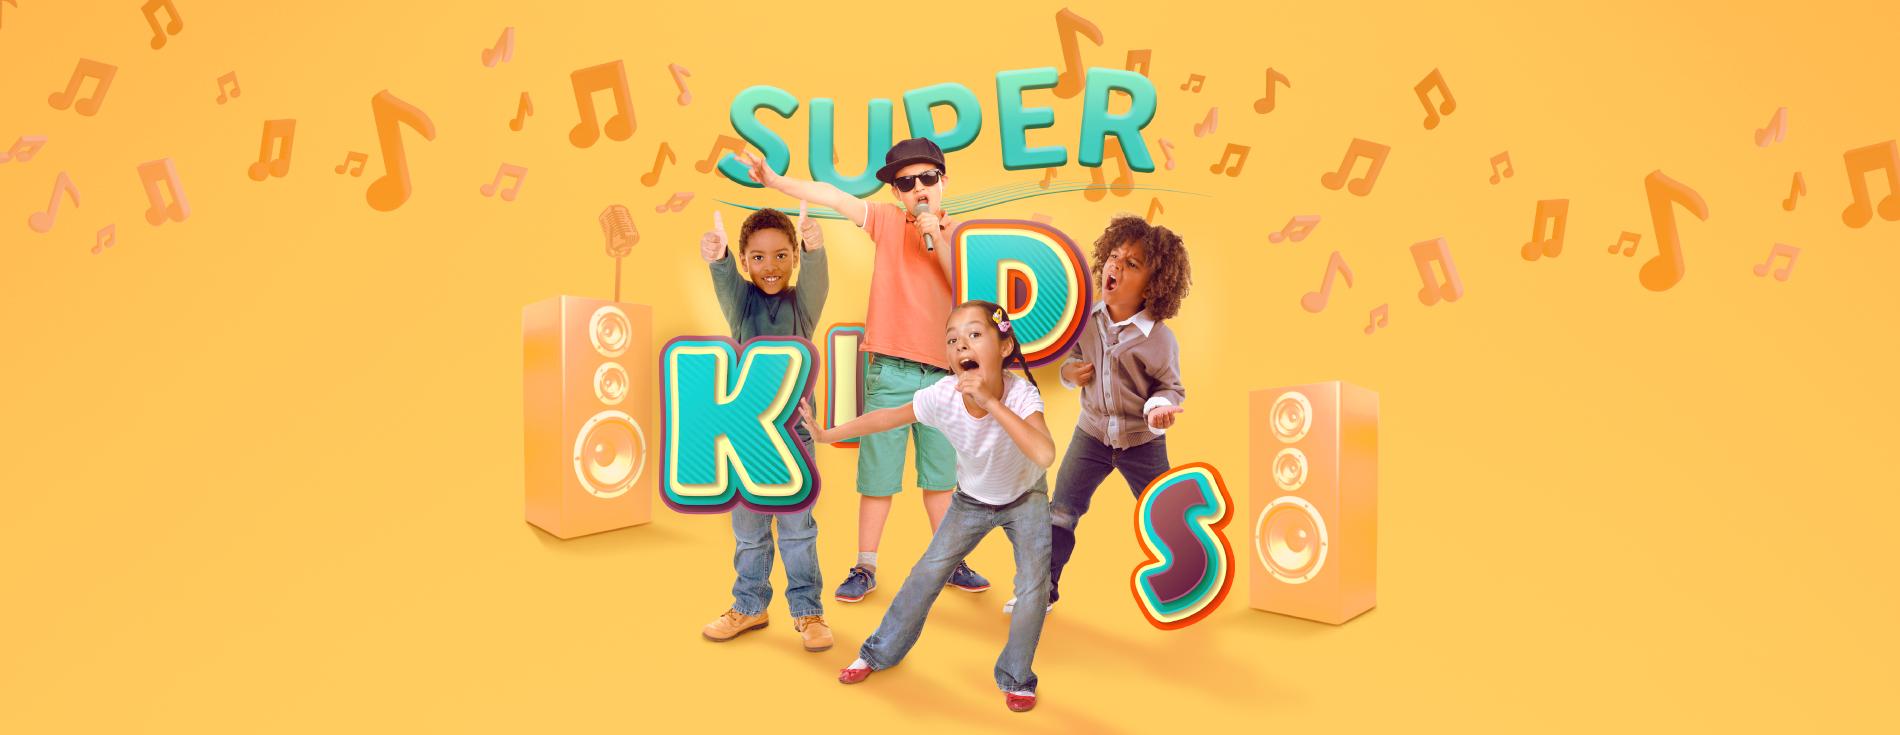 Super kids - Sincelejo